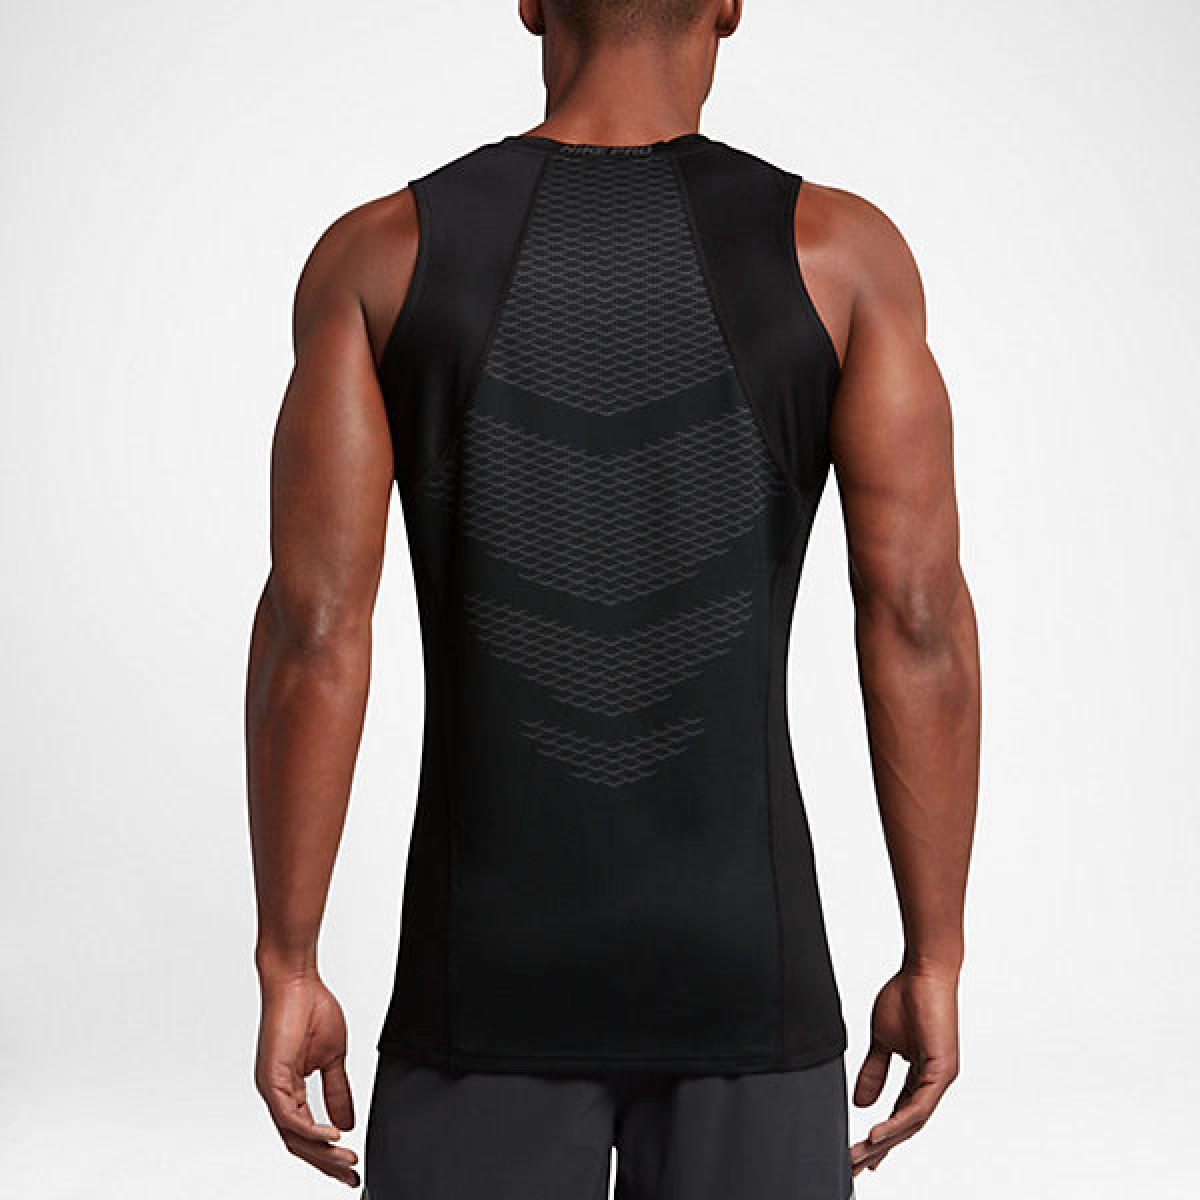 Nike Pro Hypercool Tank 'Black' 828160-010